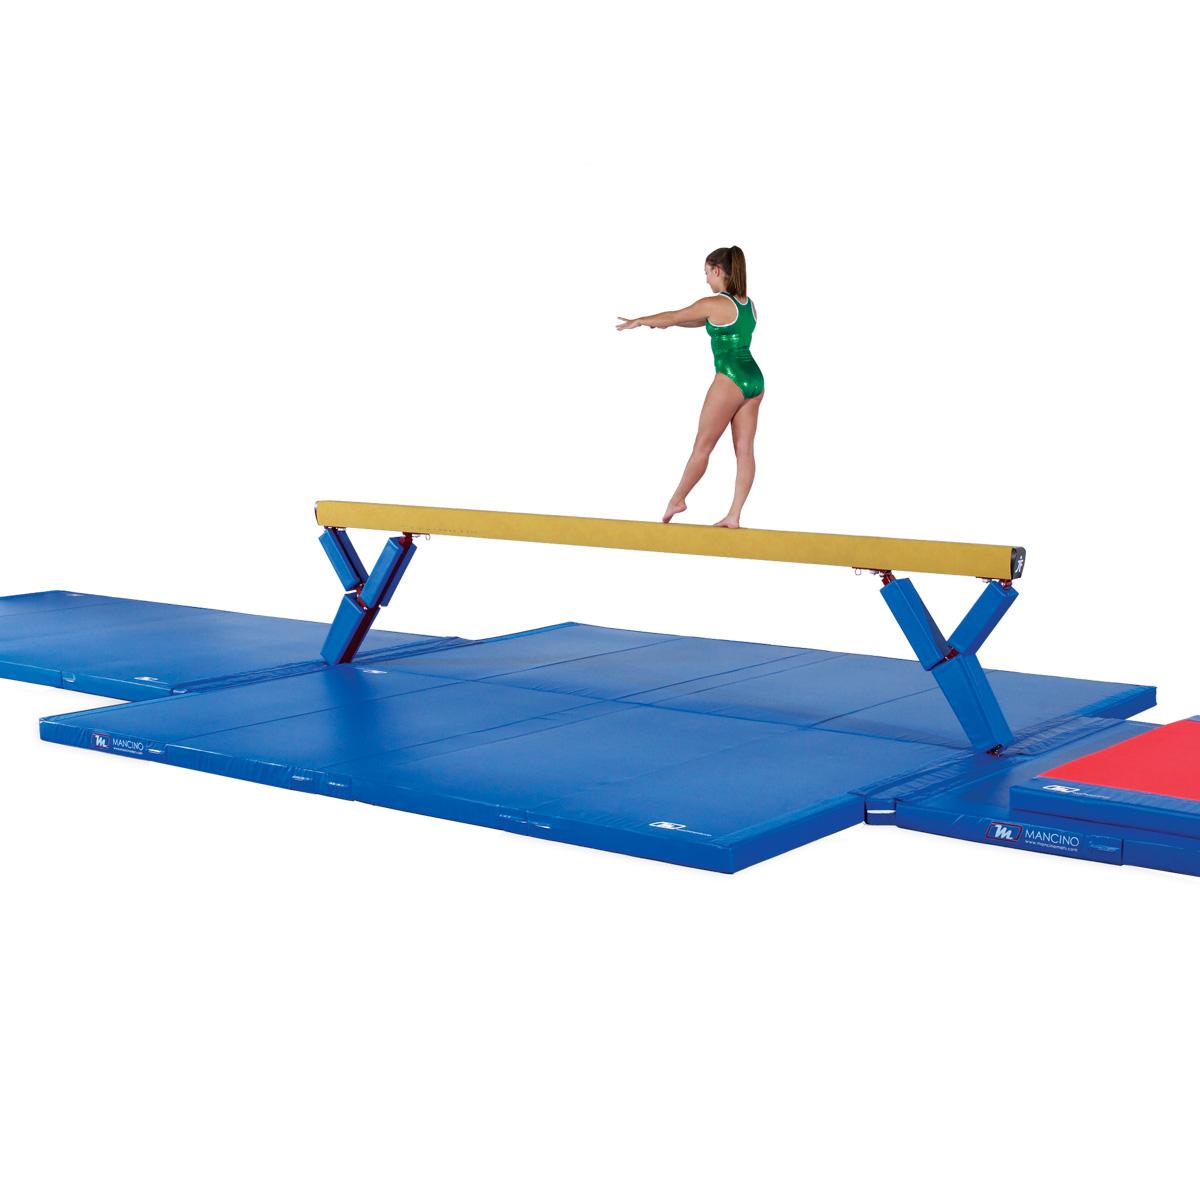 12cm folding Competition landing mats gymnastics landing mat